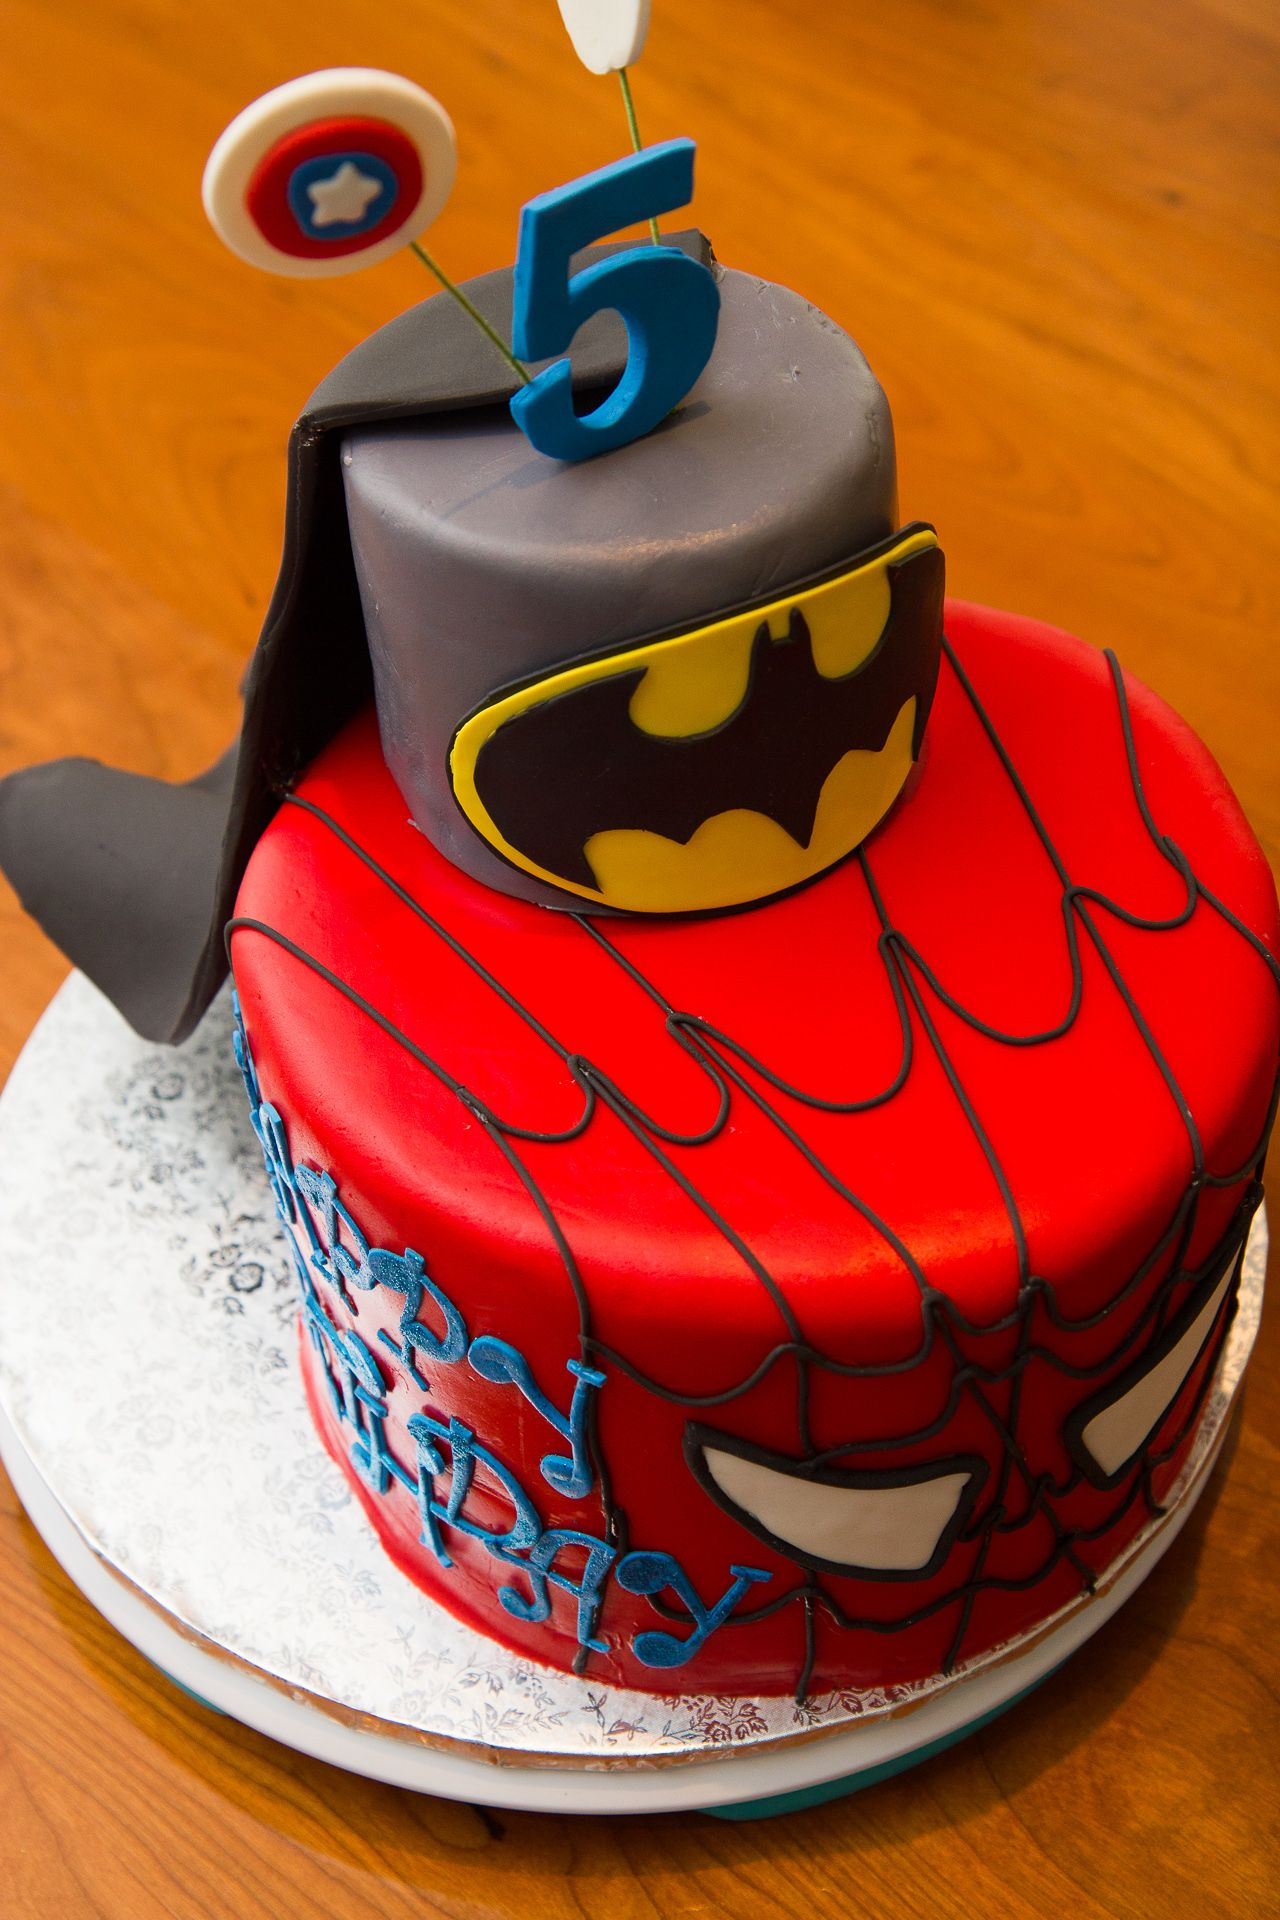 coloring pages batman spiderman cakes - photo#35